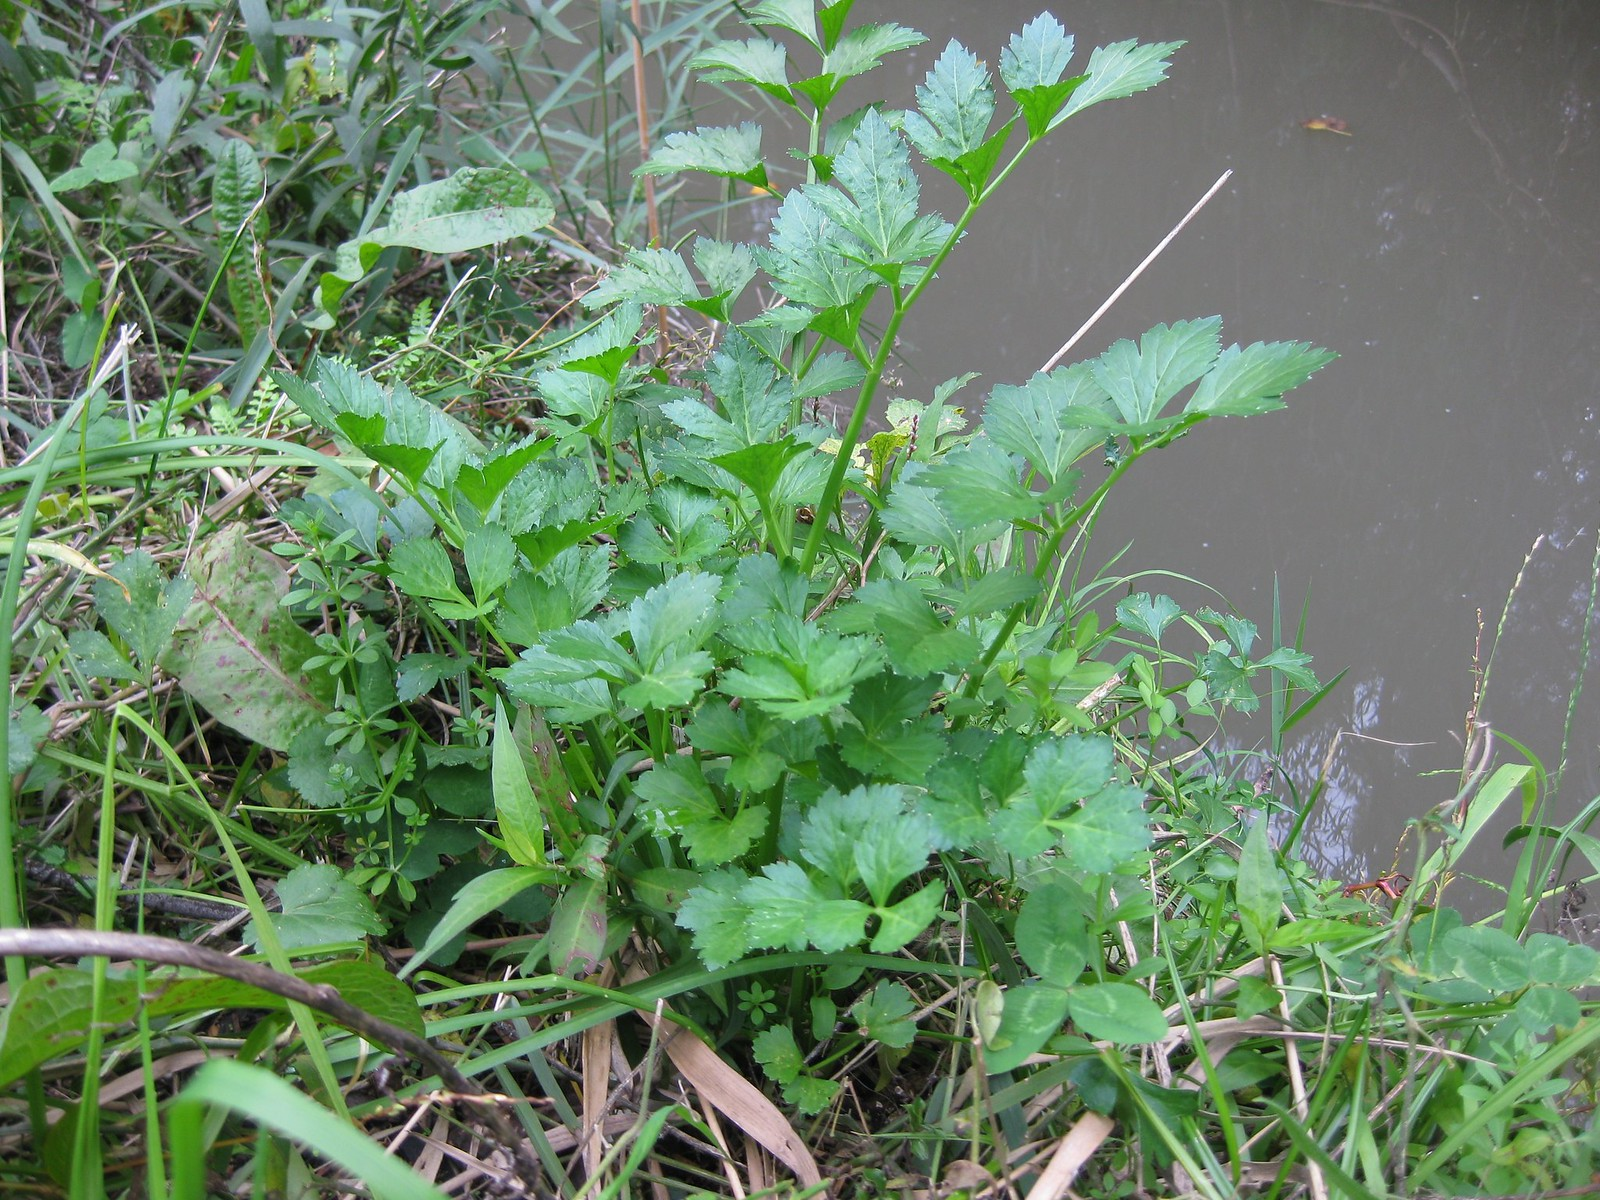 wild celery (Apium graveolens)